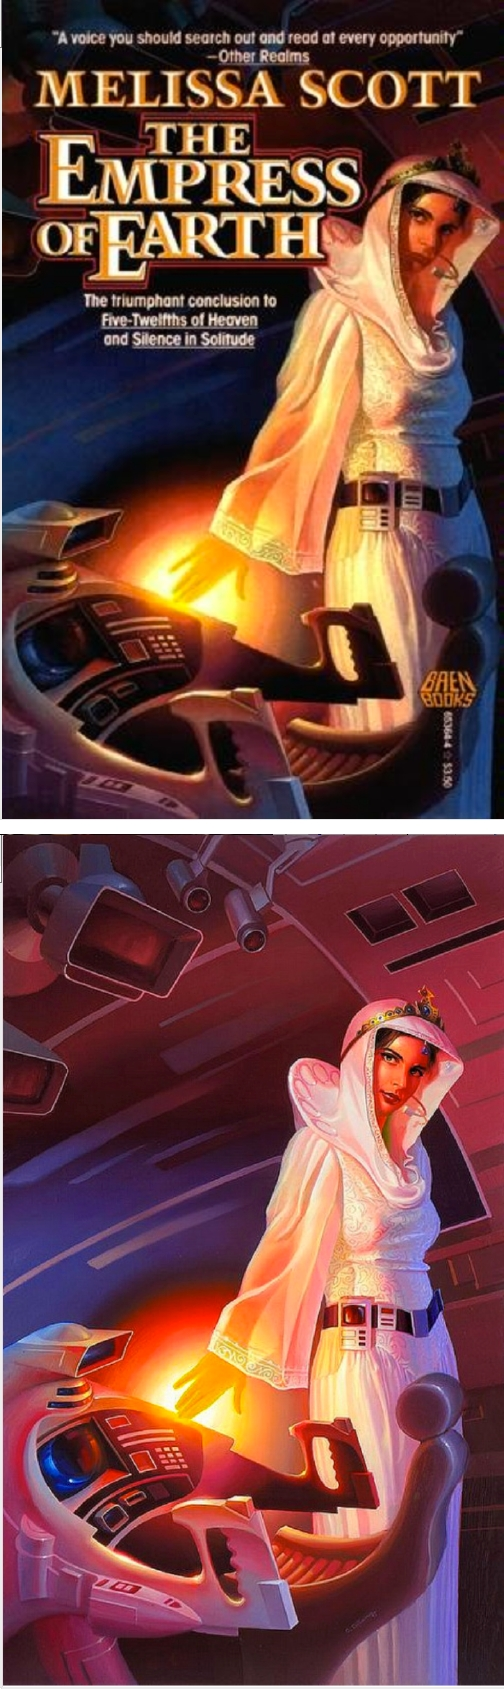 ALAN GUTIERREZ The Empress of Earth by Melissa Scott